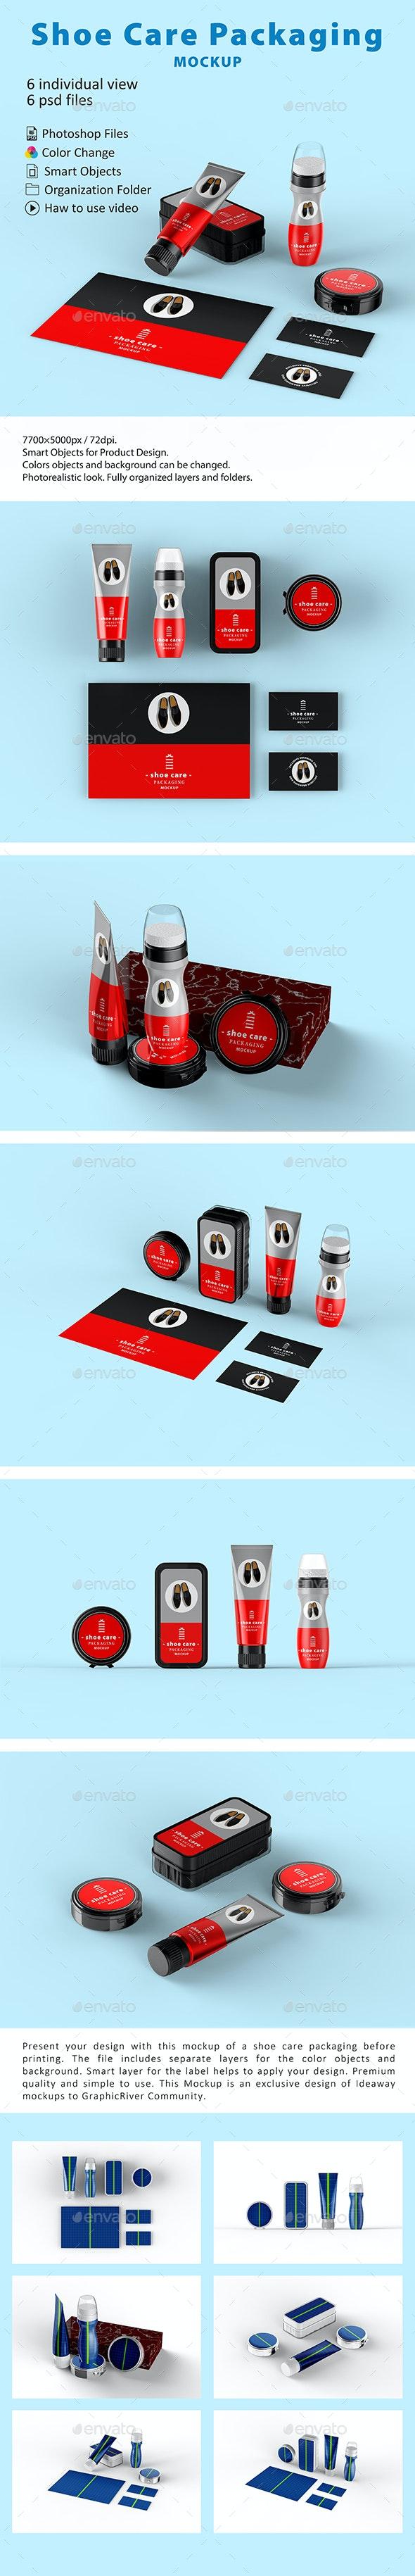 Shoe Care Packaging Mockup - Packaging Product Mock-Ups